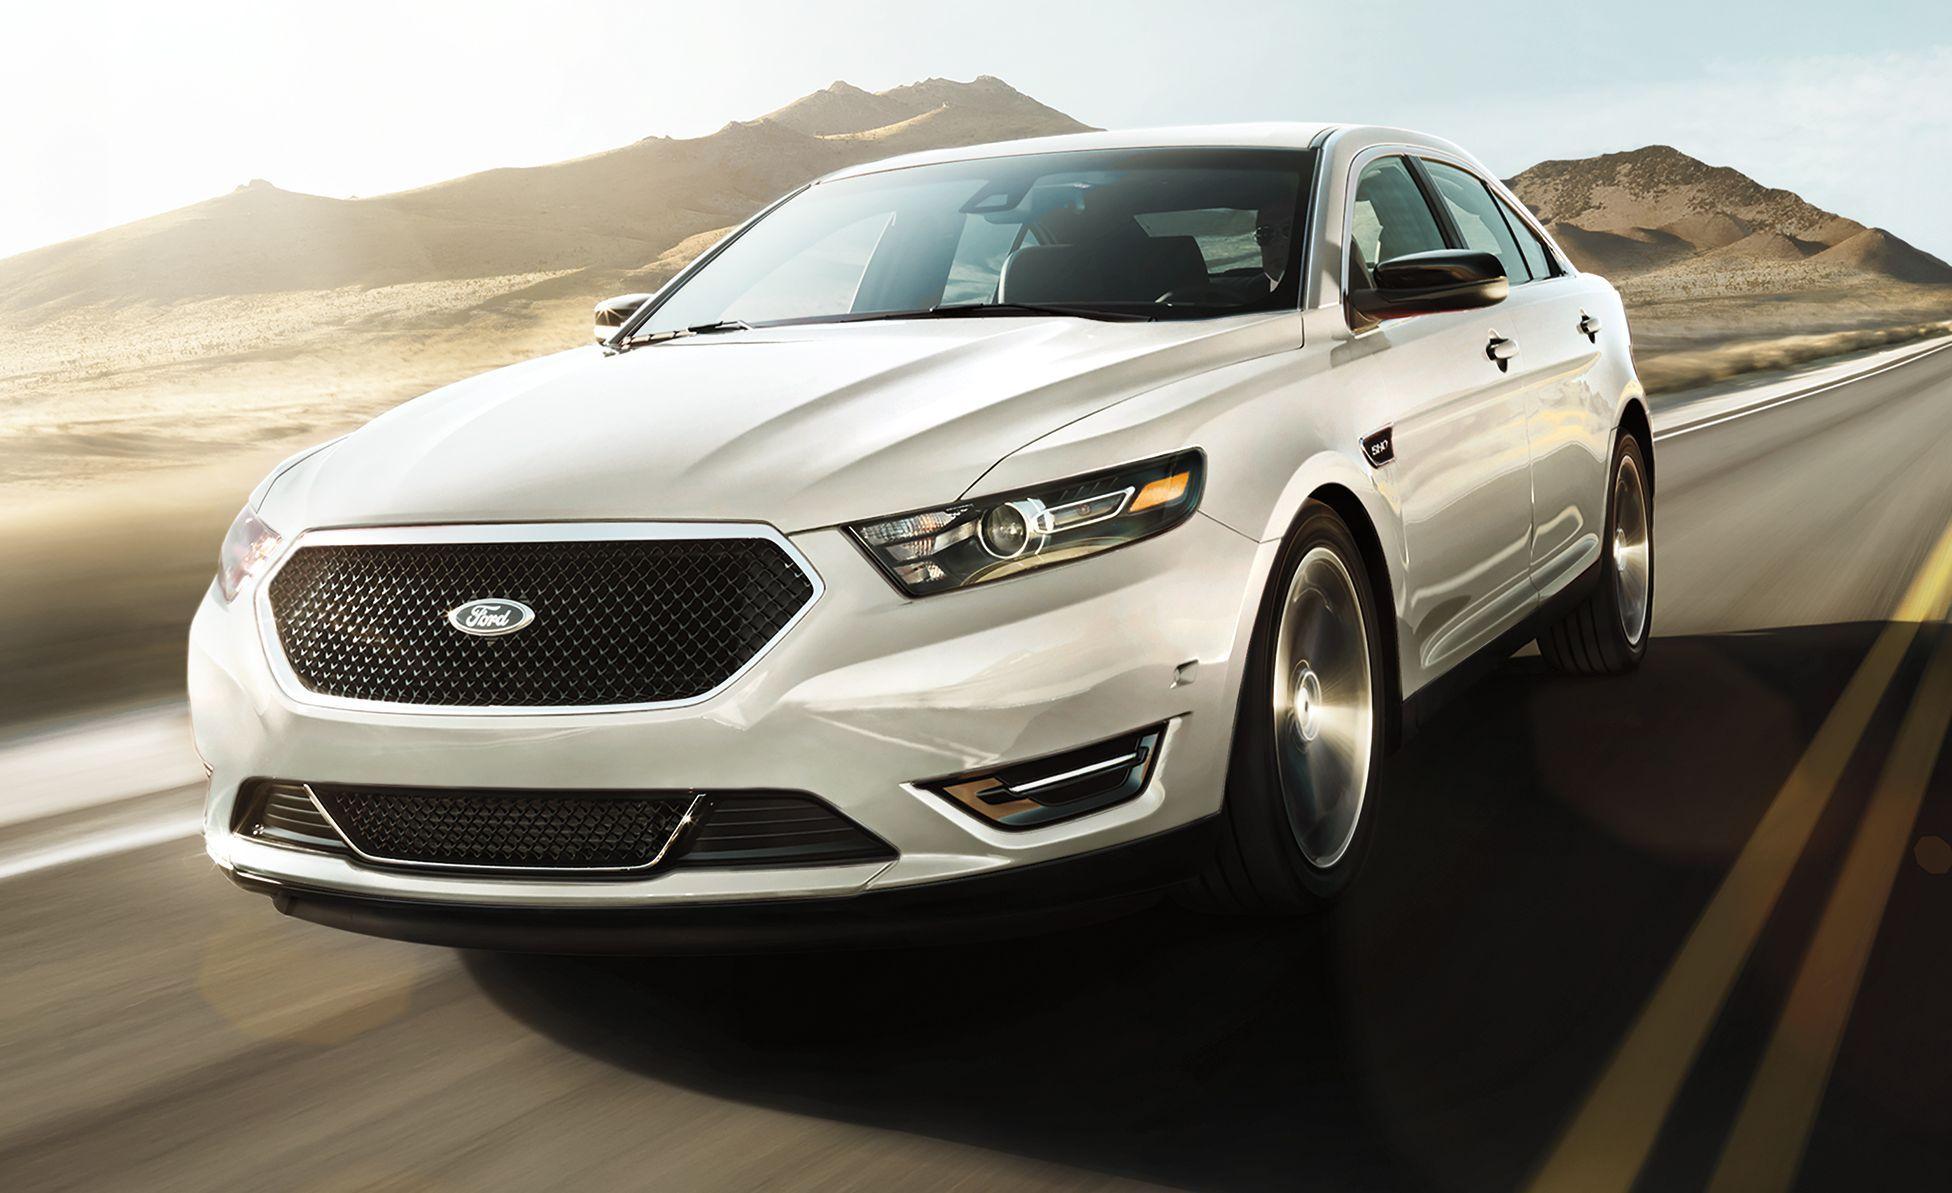 Discontinued Cars Ford Taurus In 2020 Car Ford Taurus Taurus Ford